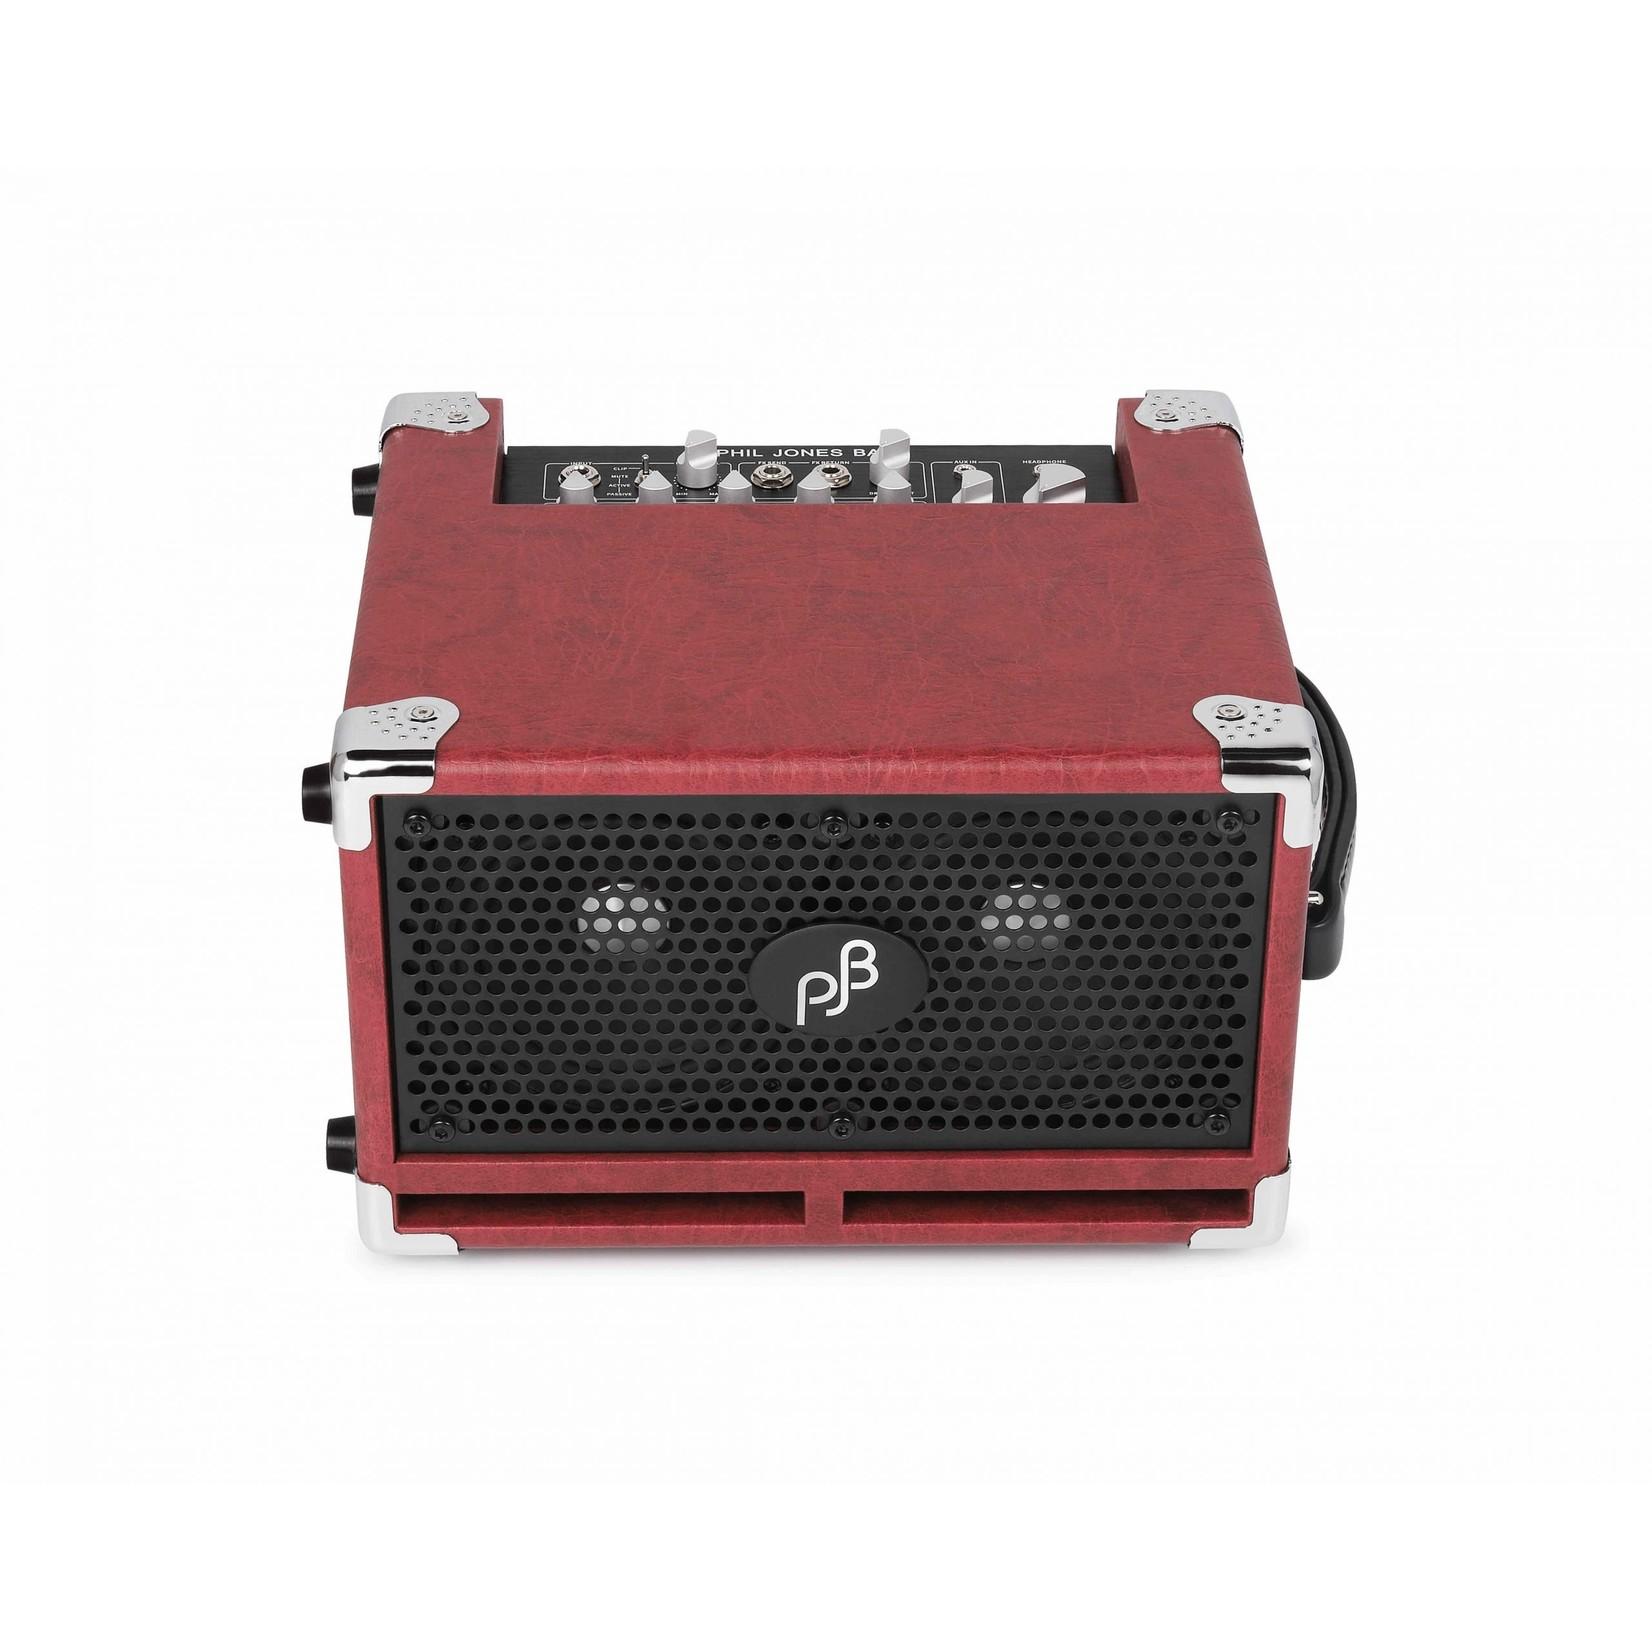 "Phil Jones Phil Jones Bass Cub Pro 120W Micro Combo Amp 2x5"" (BG-120R), Red Cabinet"